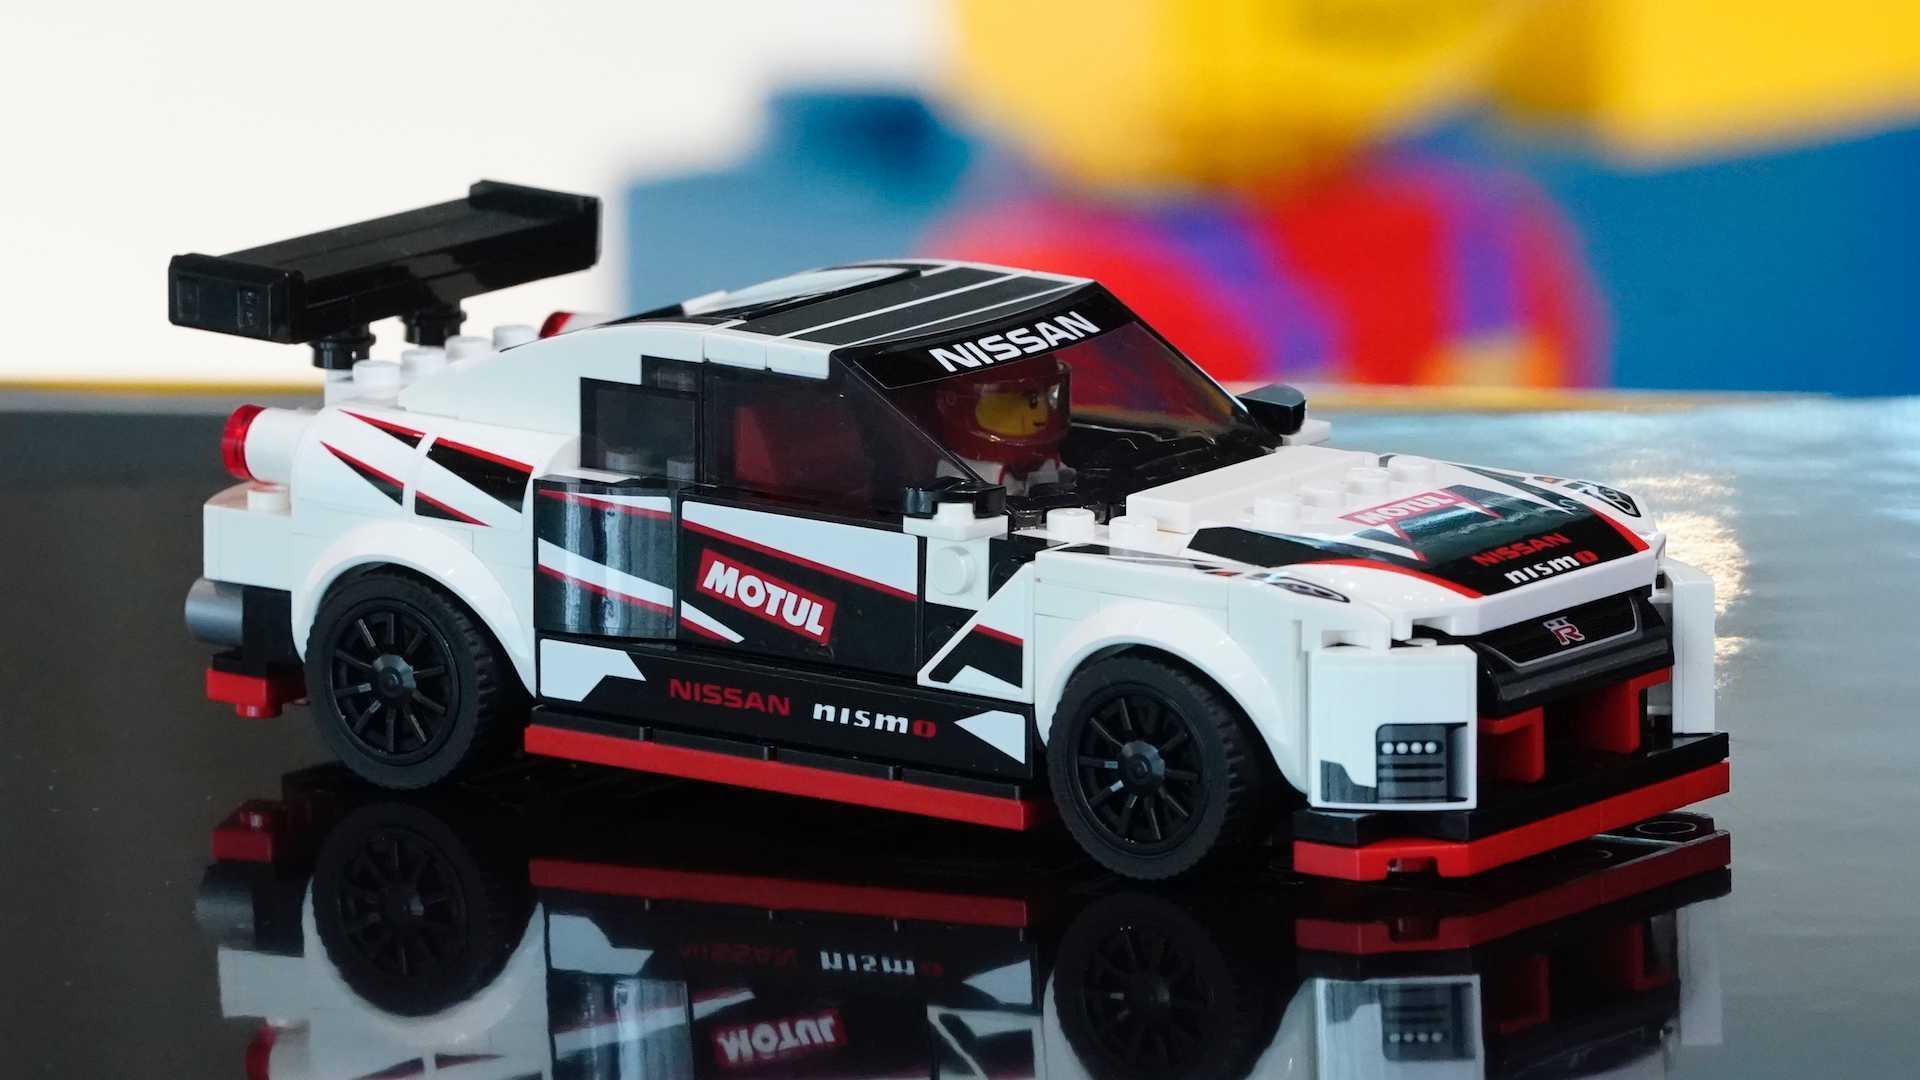 Lego Nissan GT-R Nismo looks like one fast brick